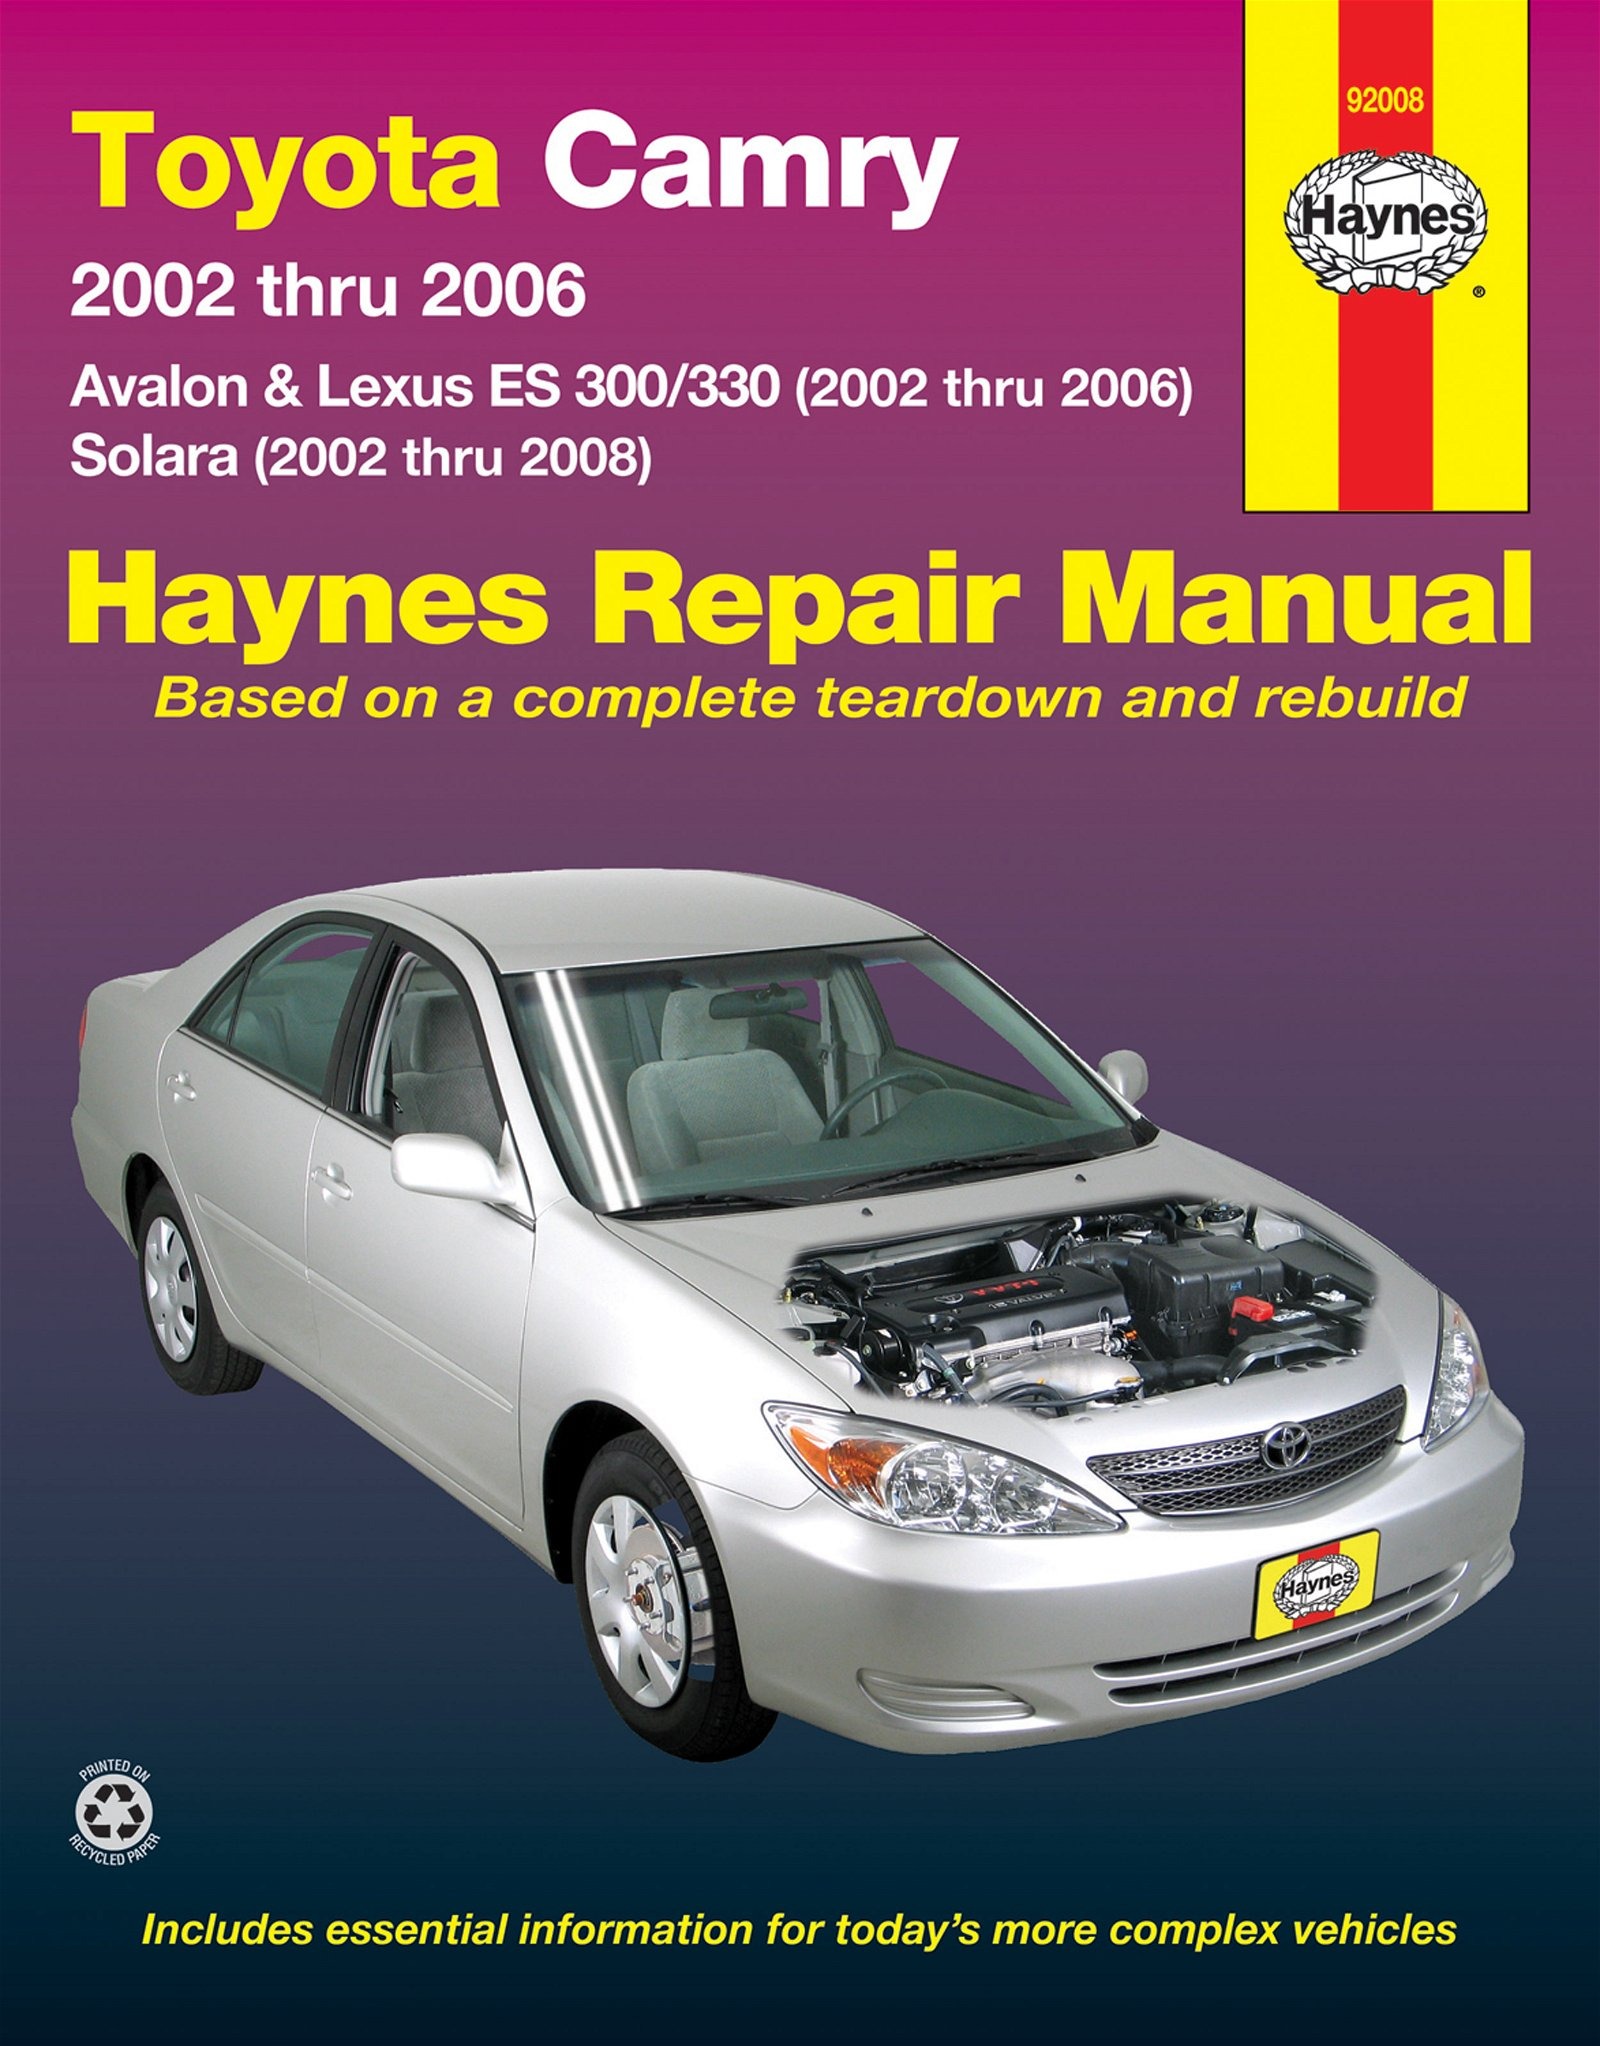 [Manuel US en Anglais] Toyota Camry, Avalon, Lexus  ES 300/330  '02 -  '06